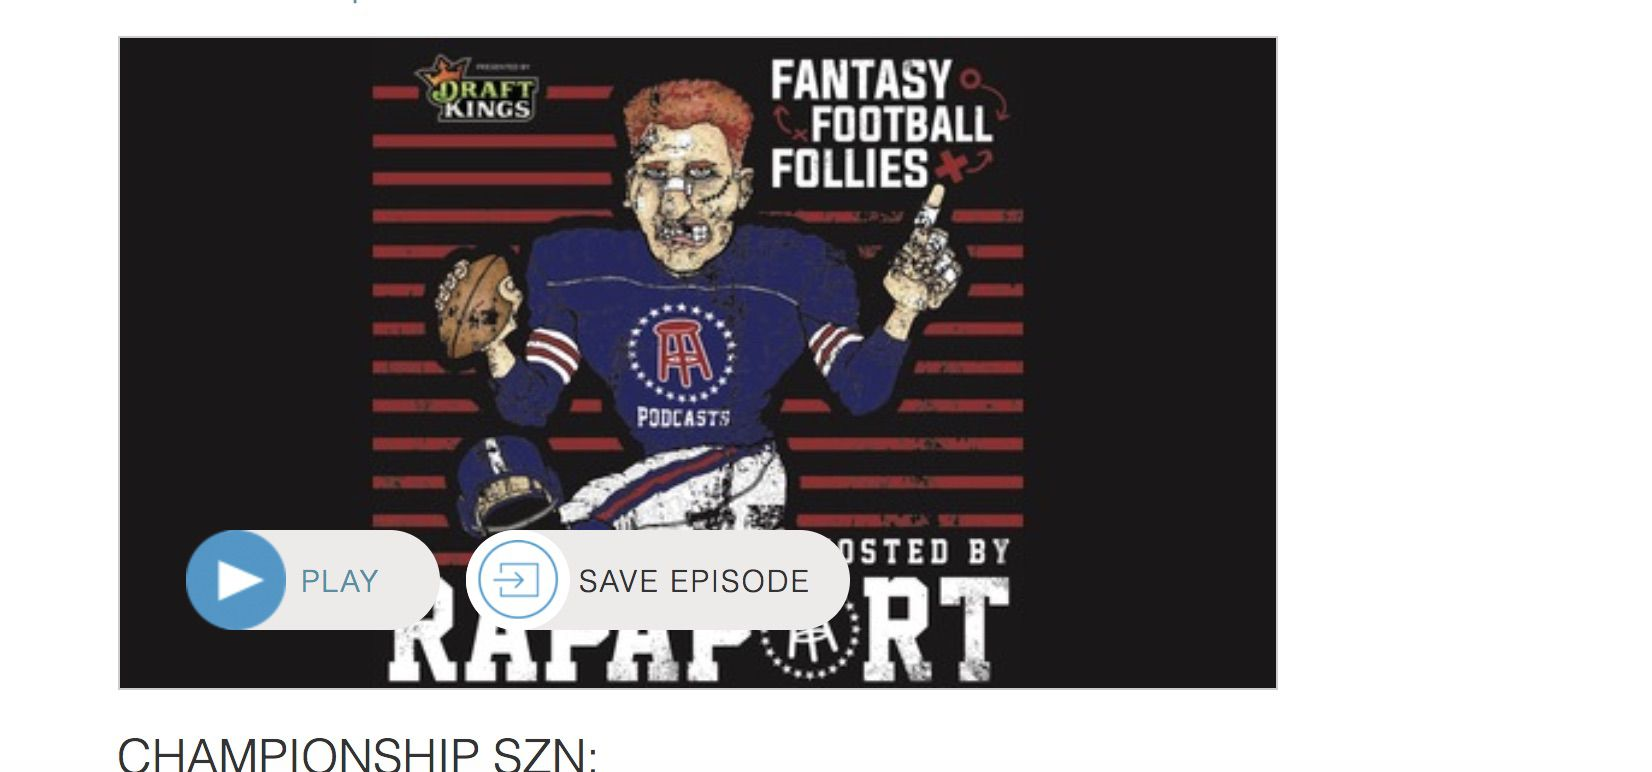 Screenshot of Fantasy Football Follies' landing page on Stitcher.